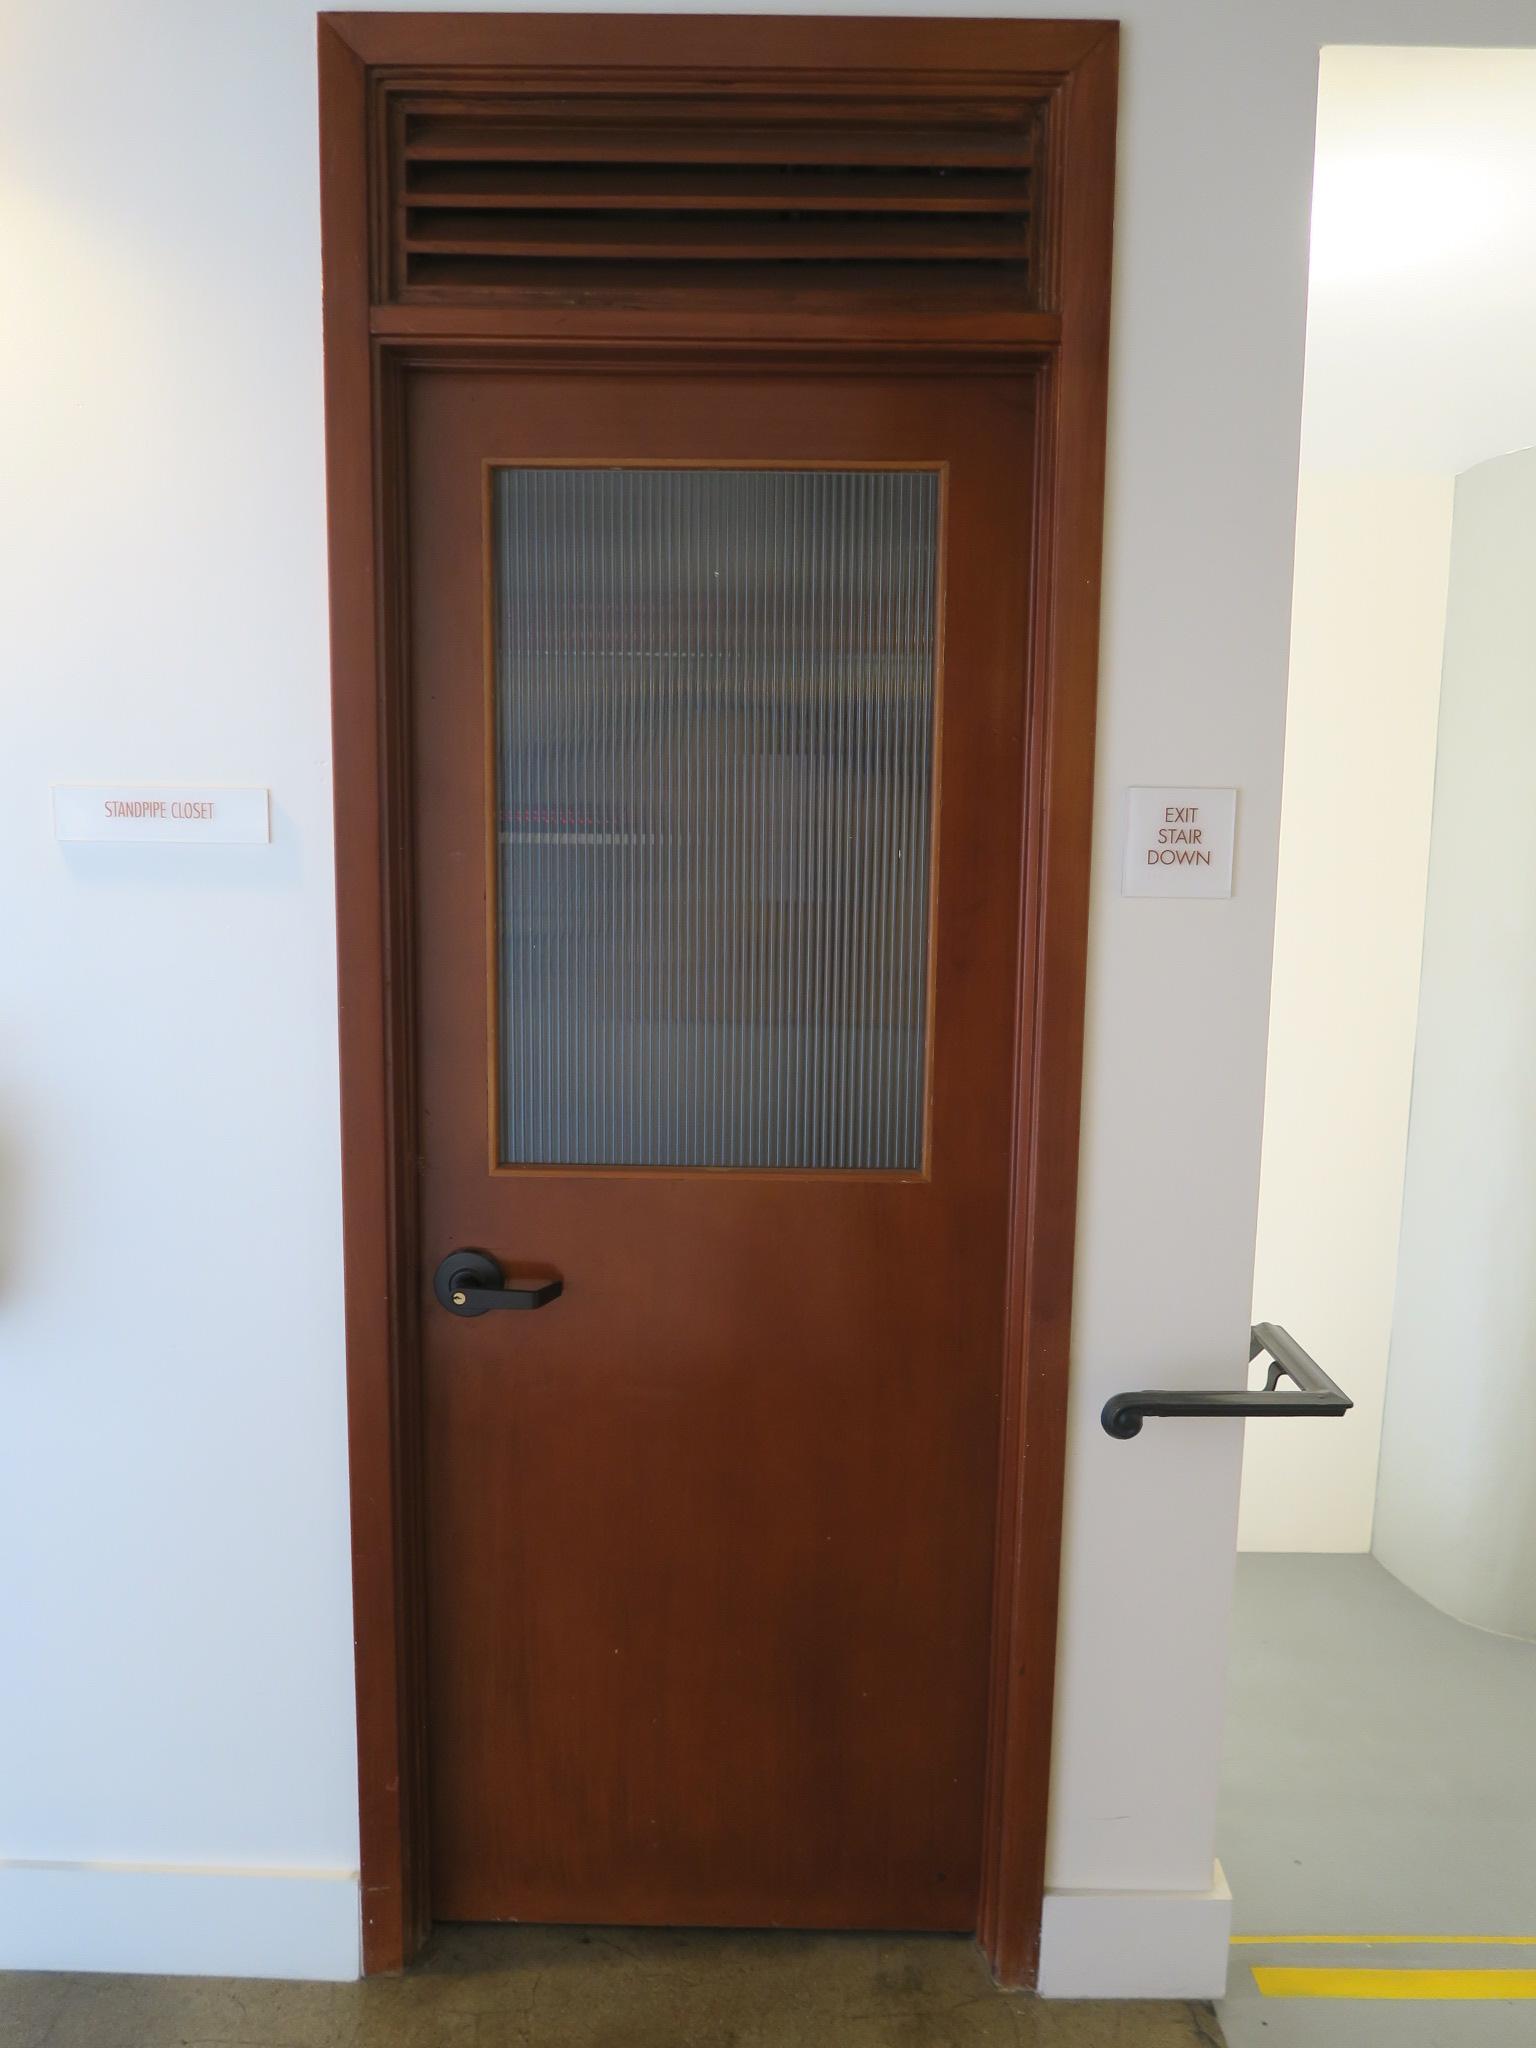 Original wood door at utility room.